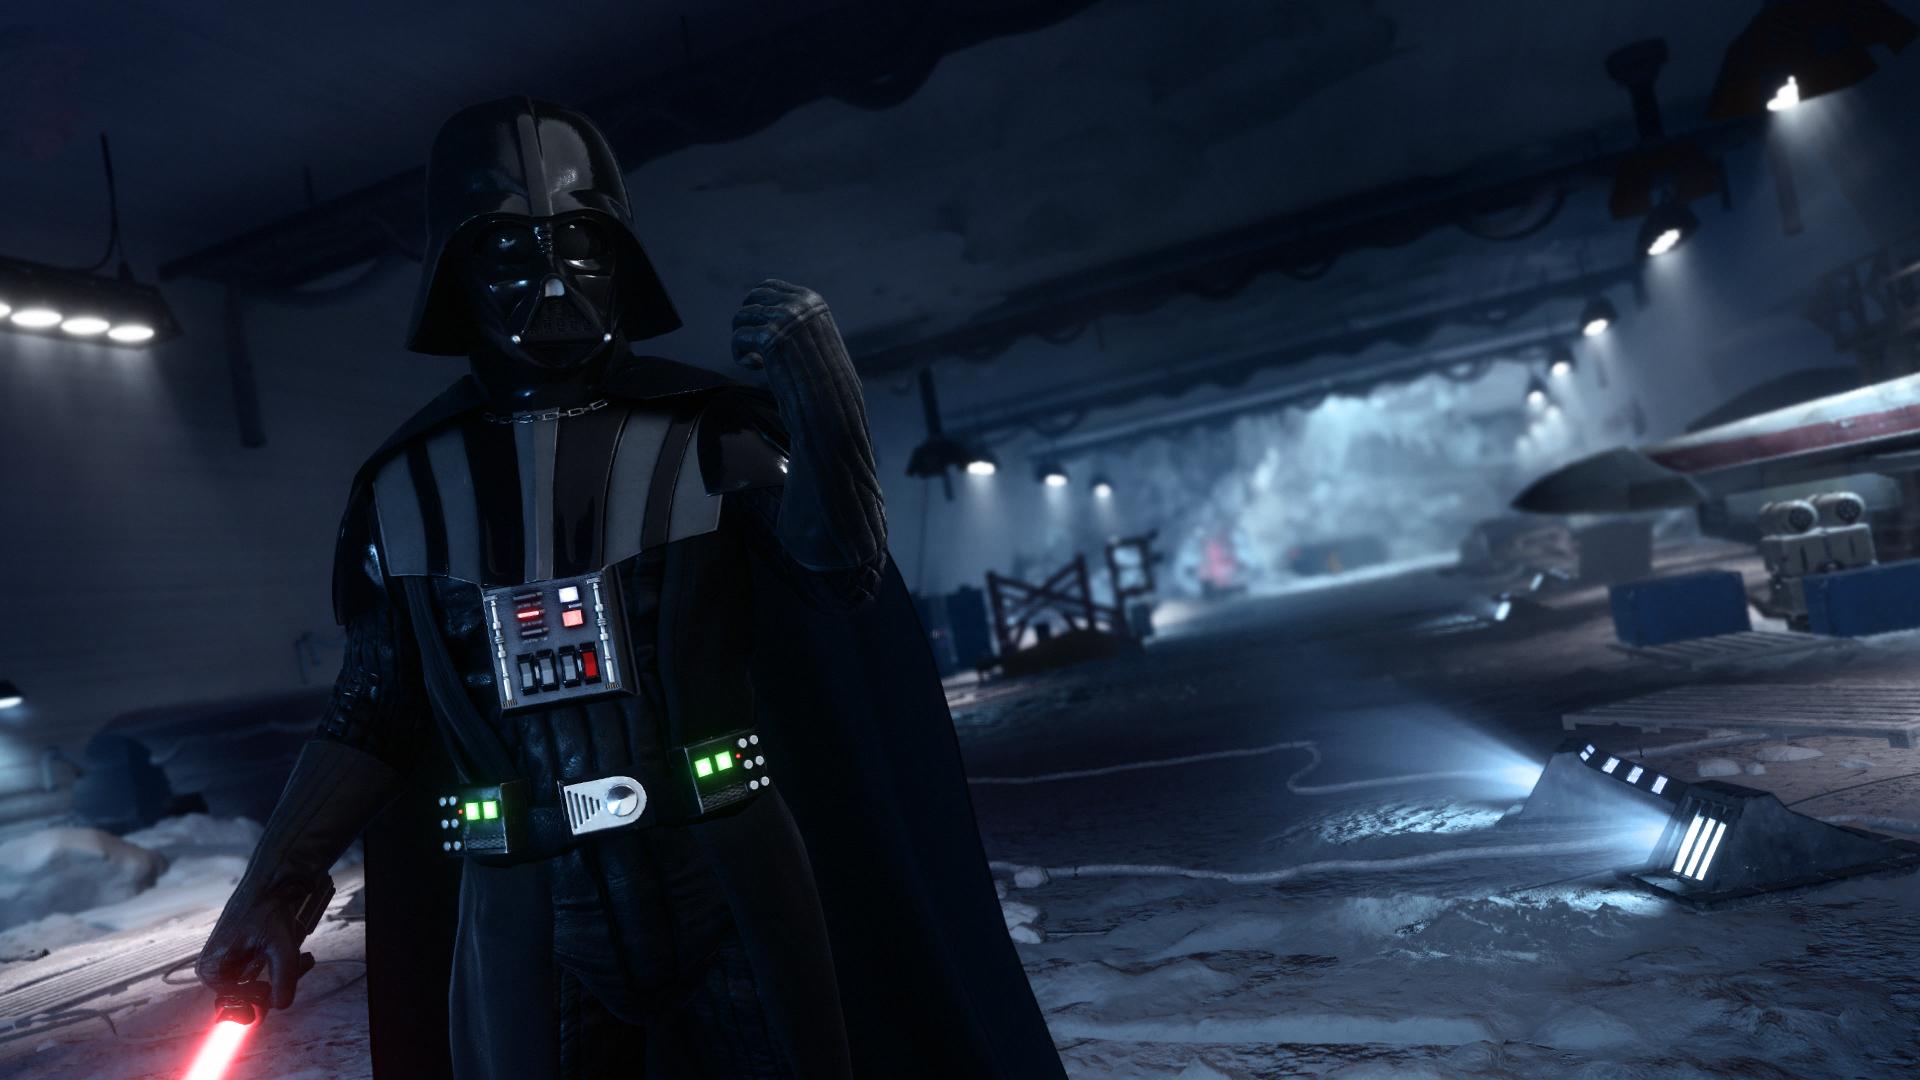 Star Wars Battlefront Darth Vader Wallpaper By Faithfullfaun1 On Deviantart